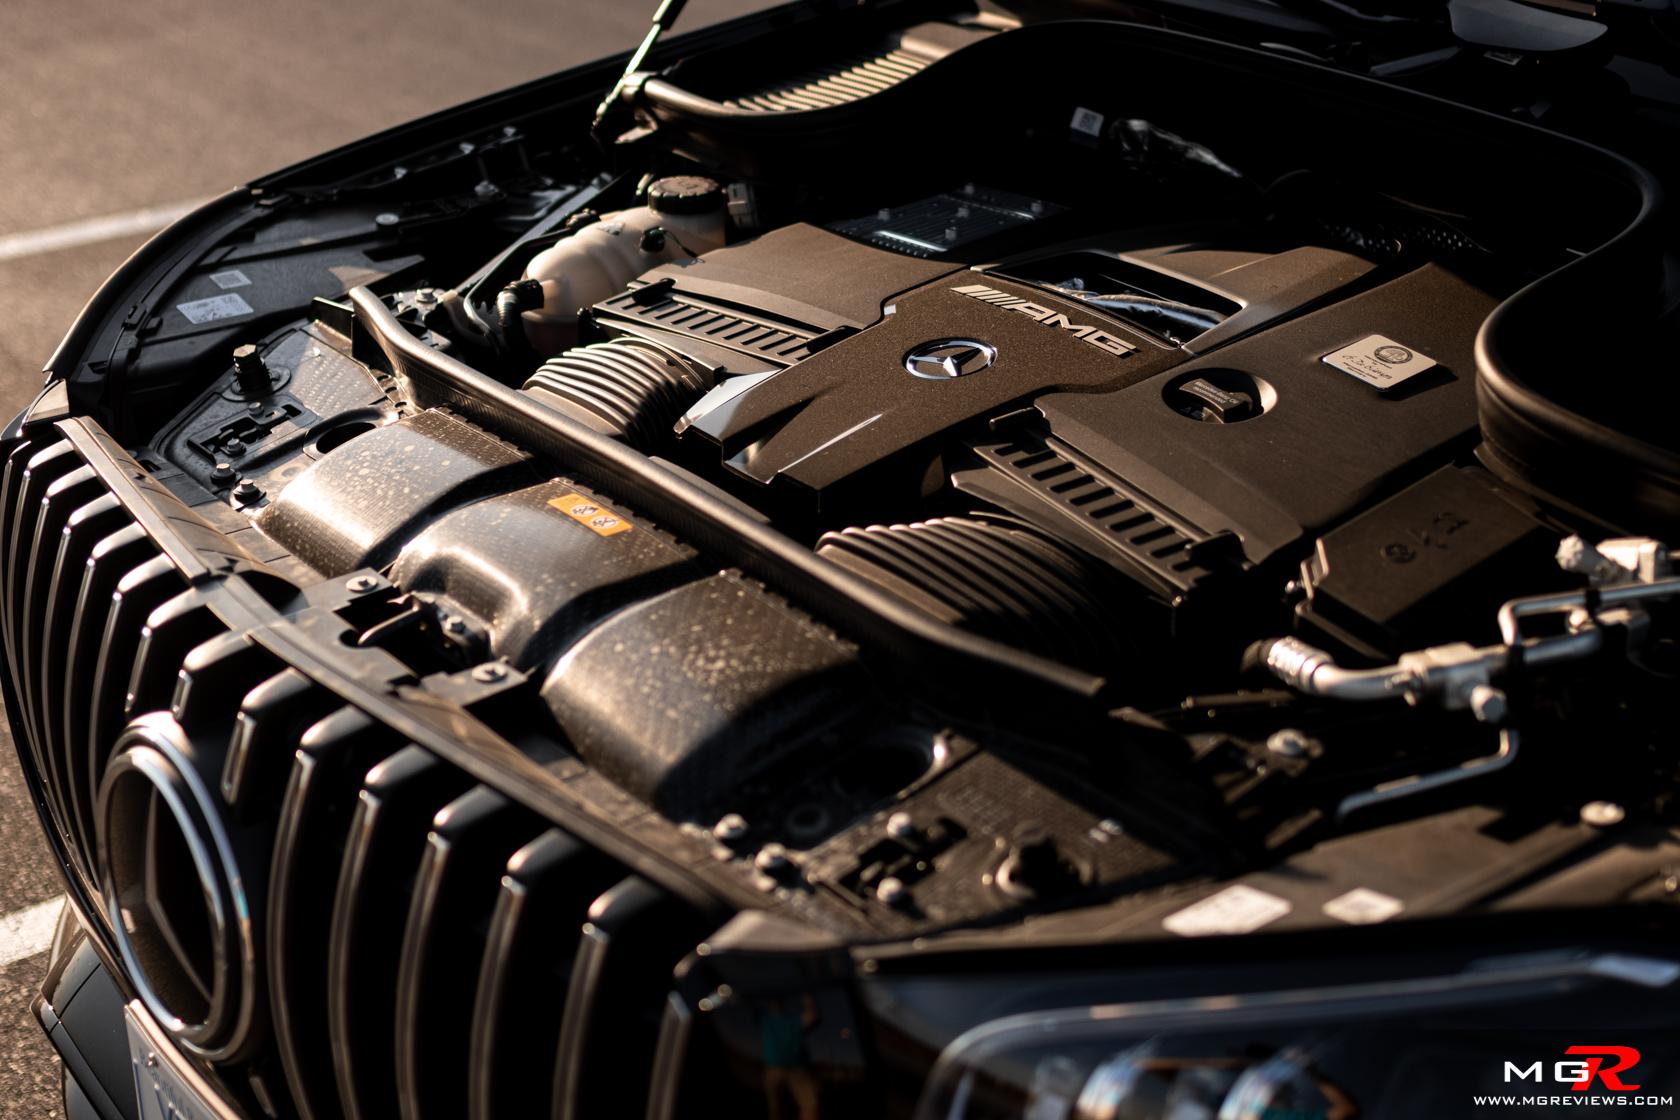 2021 Mercedes-Benz GLS 63 AMG